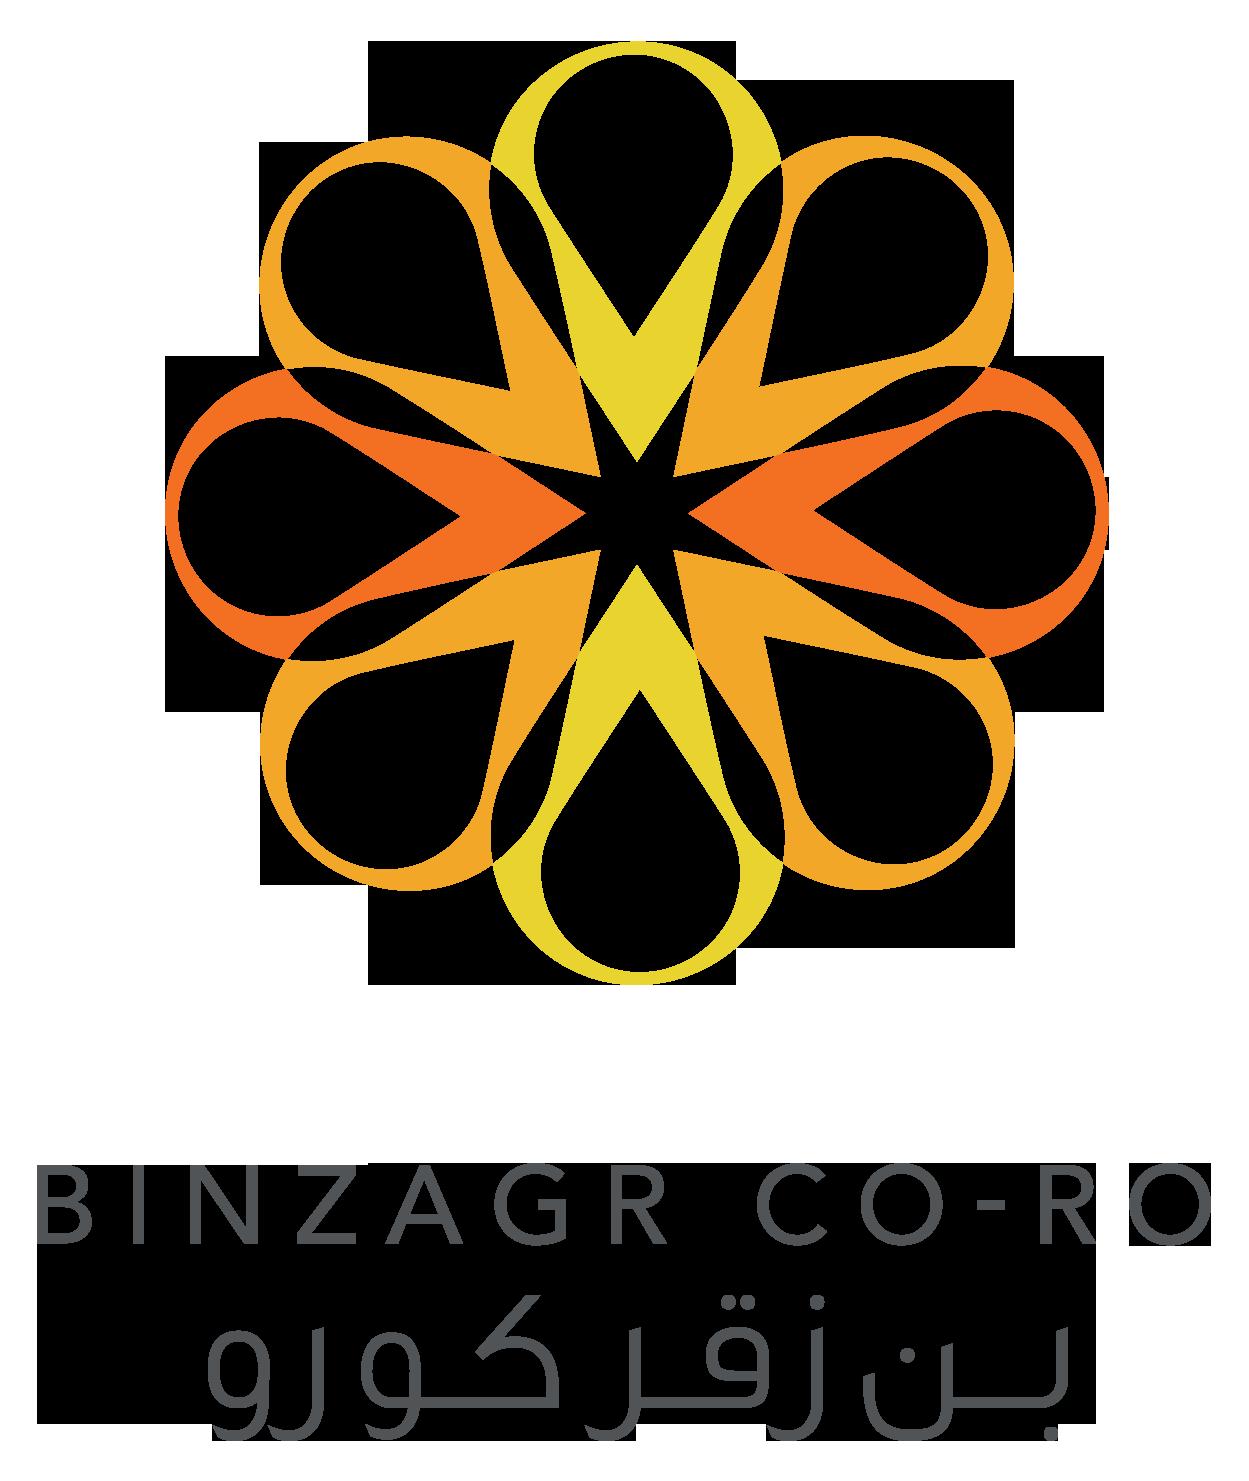 BINZAGR CO-RO max.png